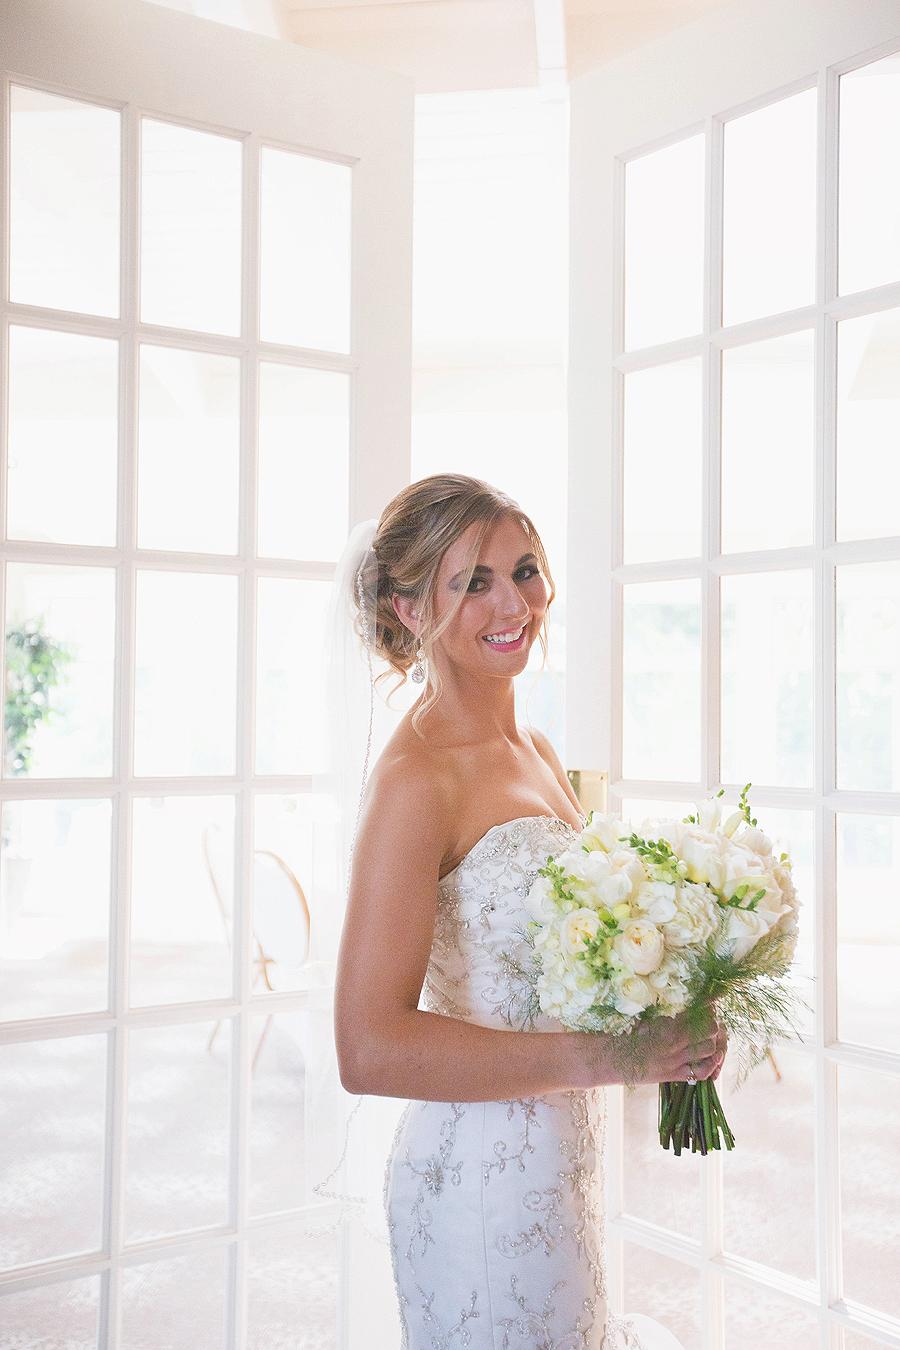 Toledo_Cleveland_Ohio_Wedding_Portrait_Photographer-24.jpg